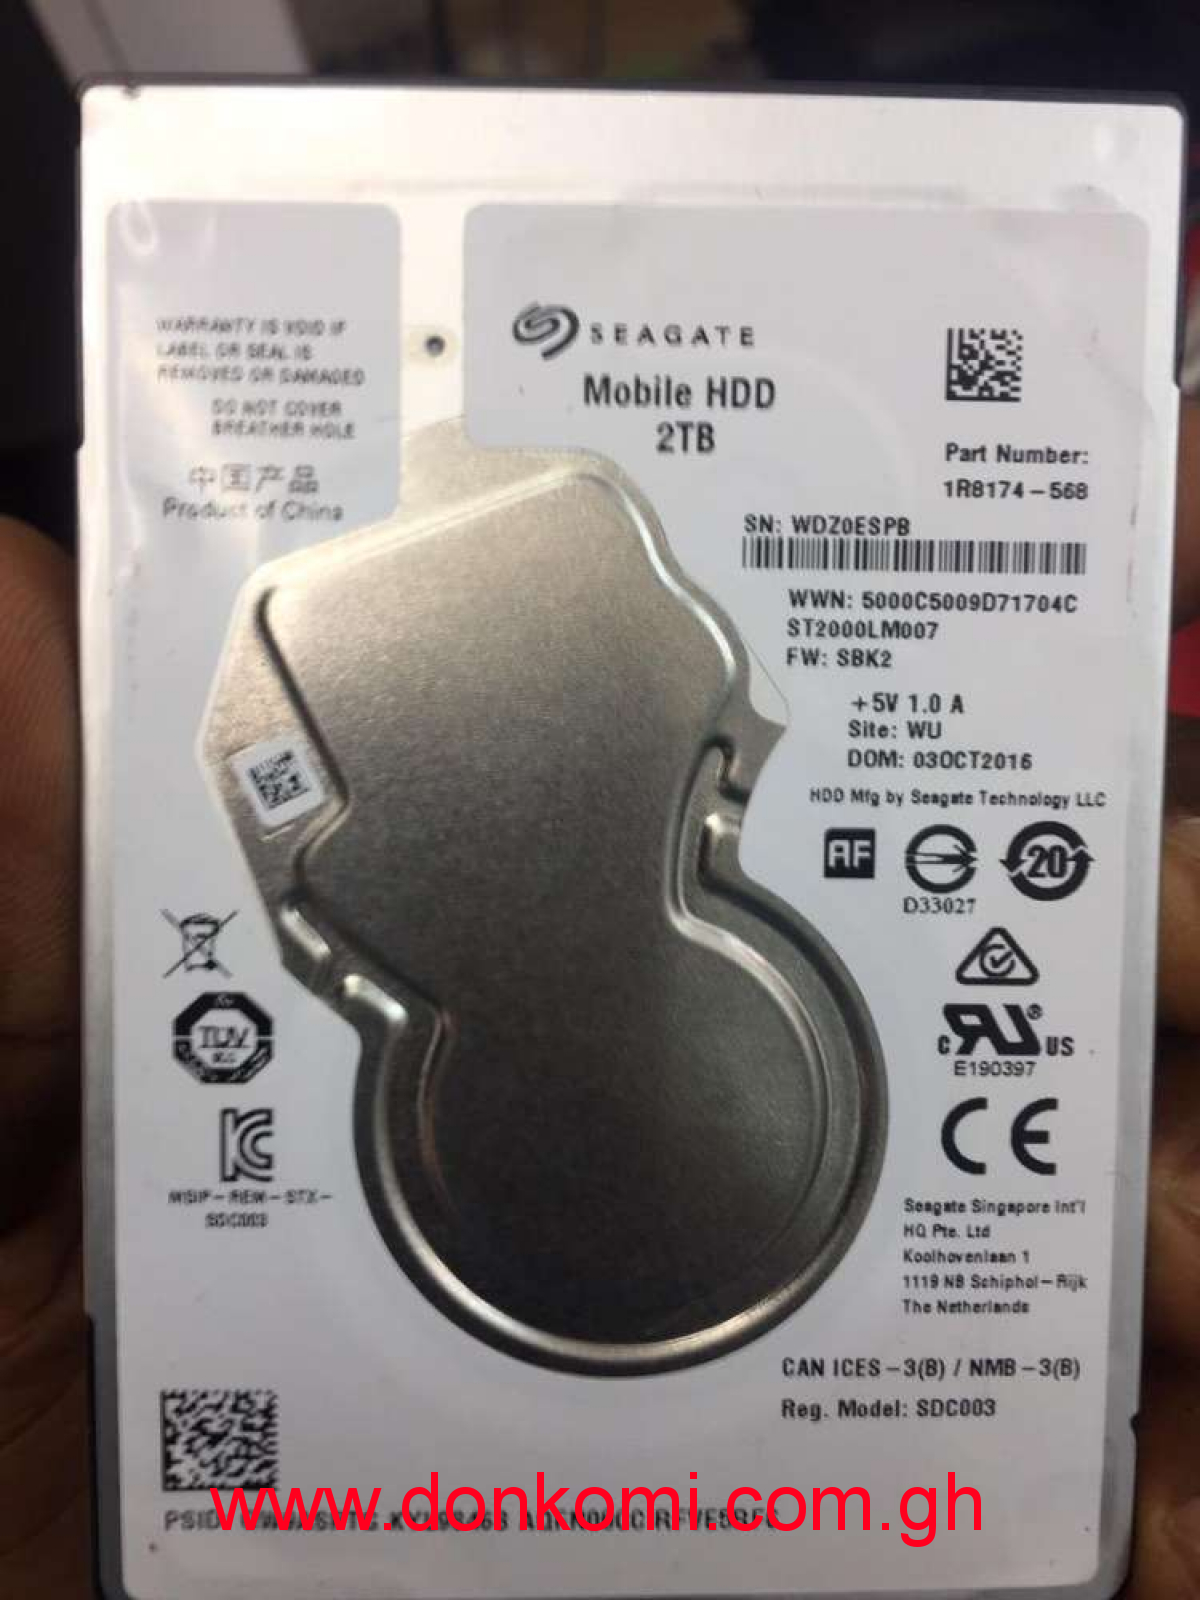 2 Terabyte Internal Laptop Hard Disk